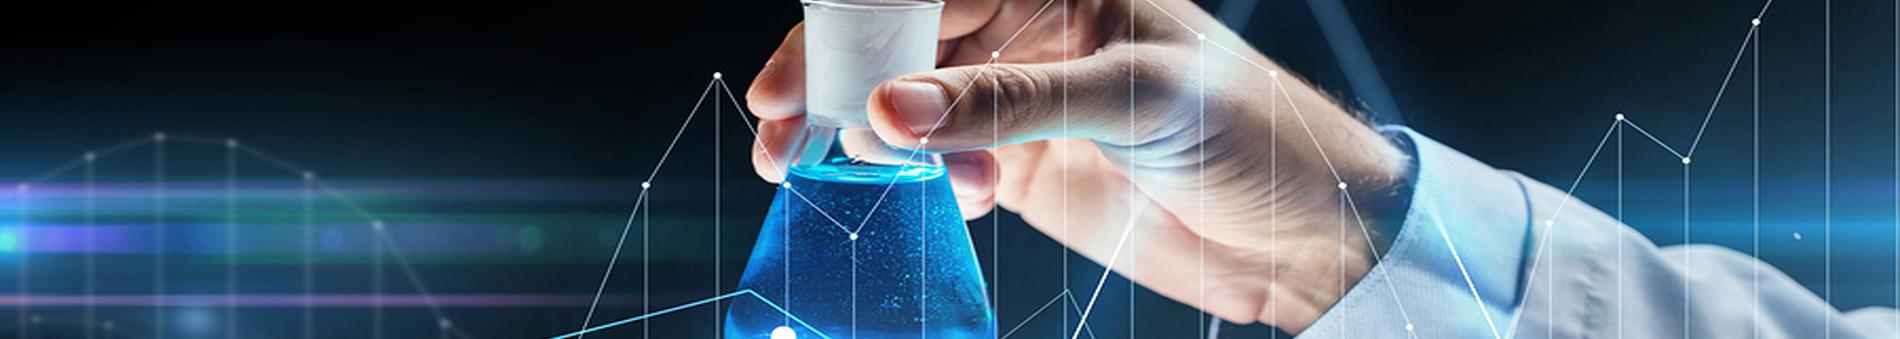 ebrator biochemicals products